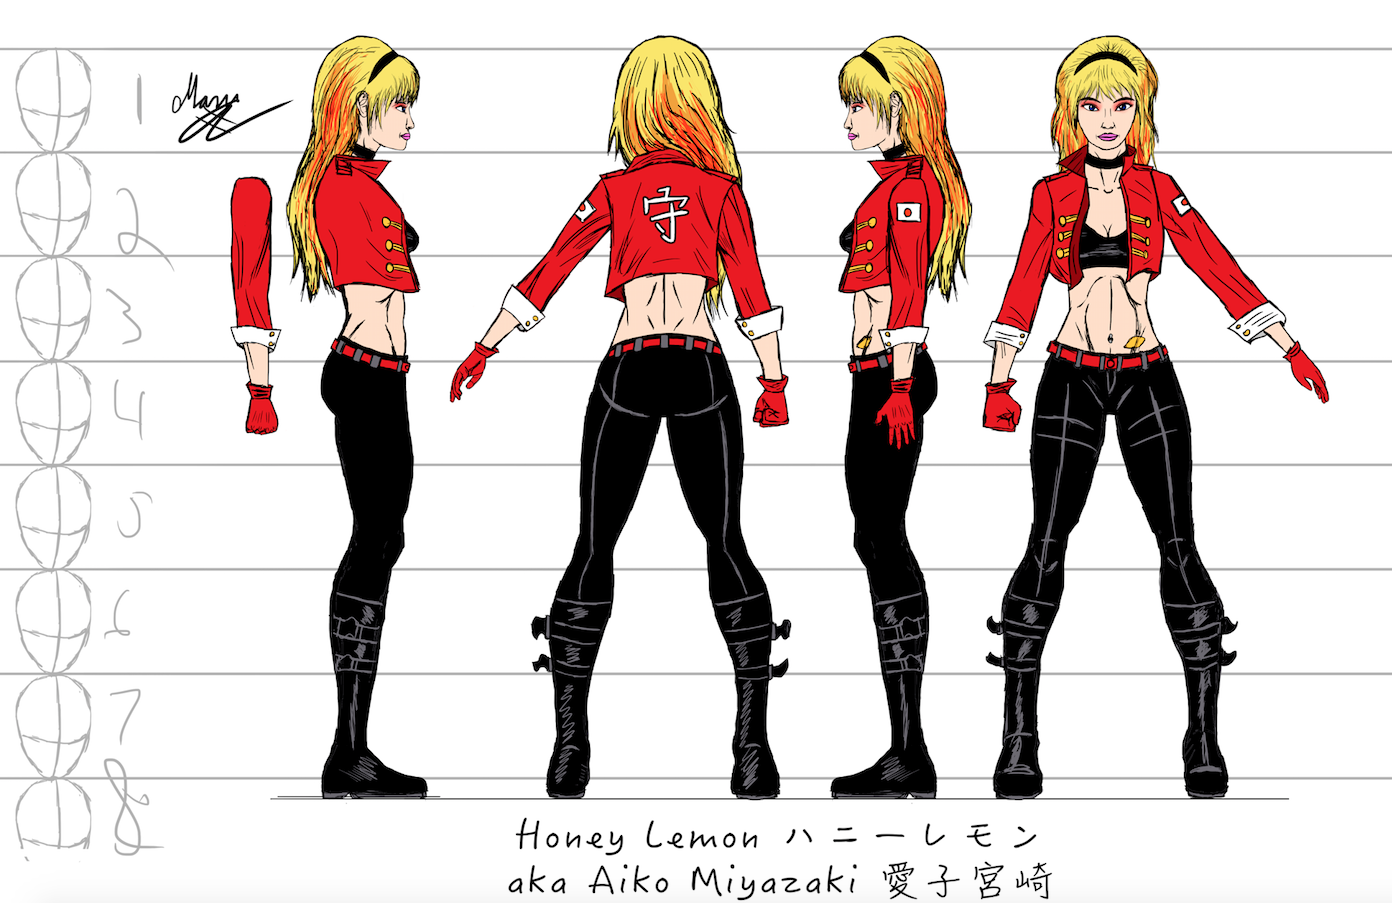 Honey Lemon character sheet #4